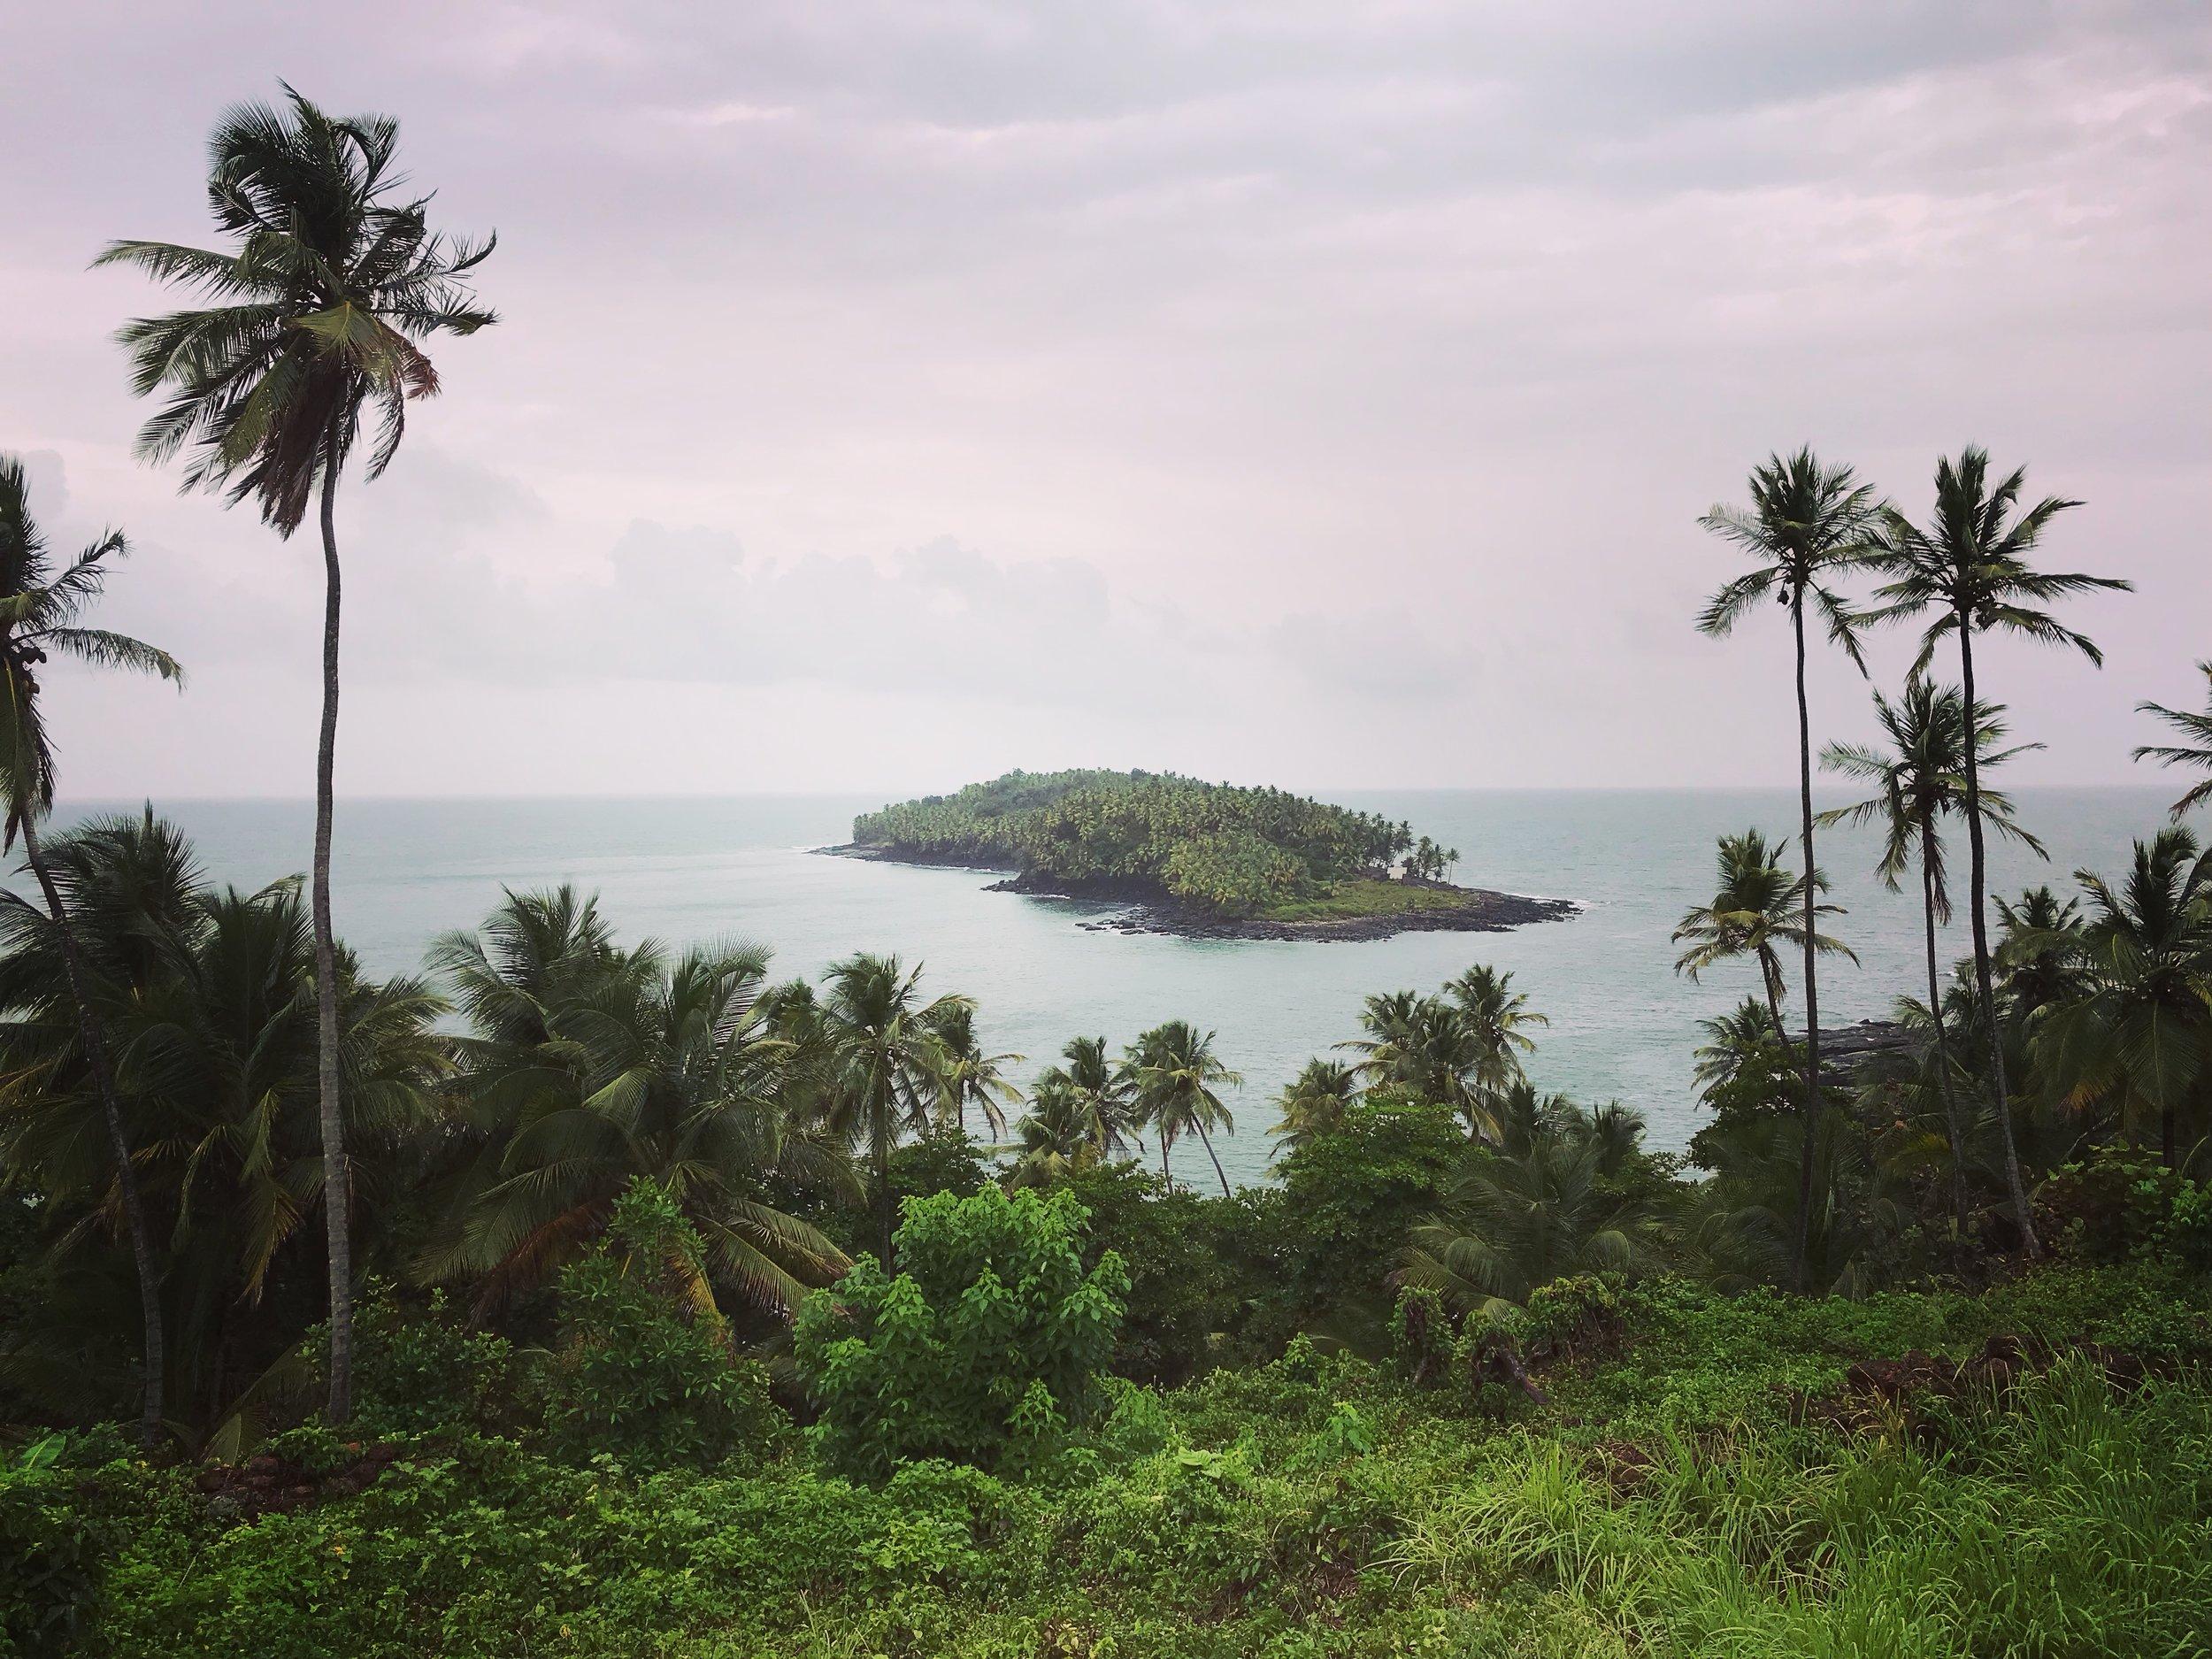 The infamous Devil's Island